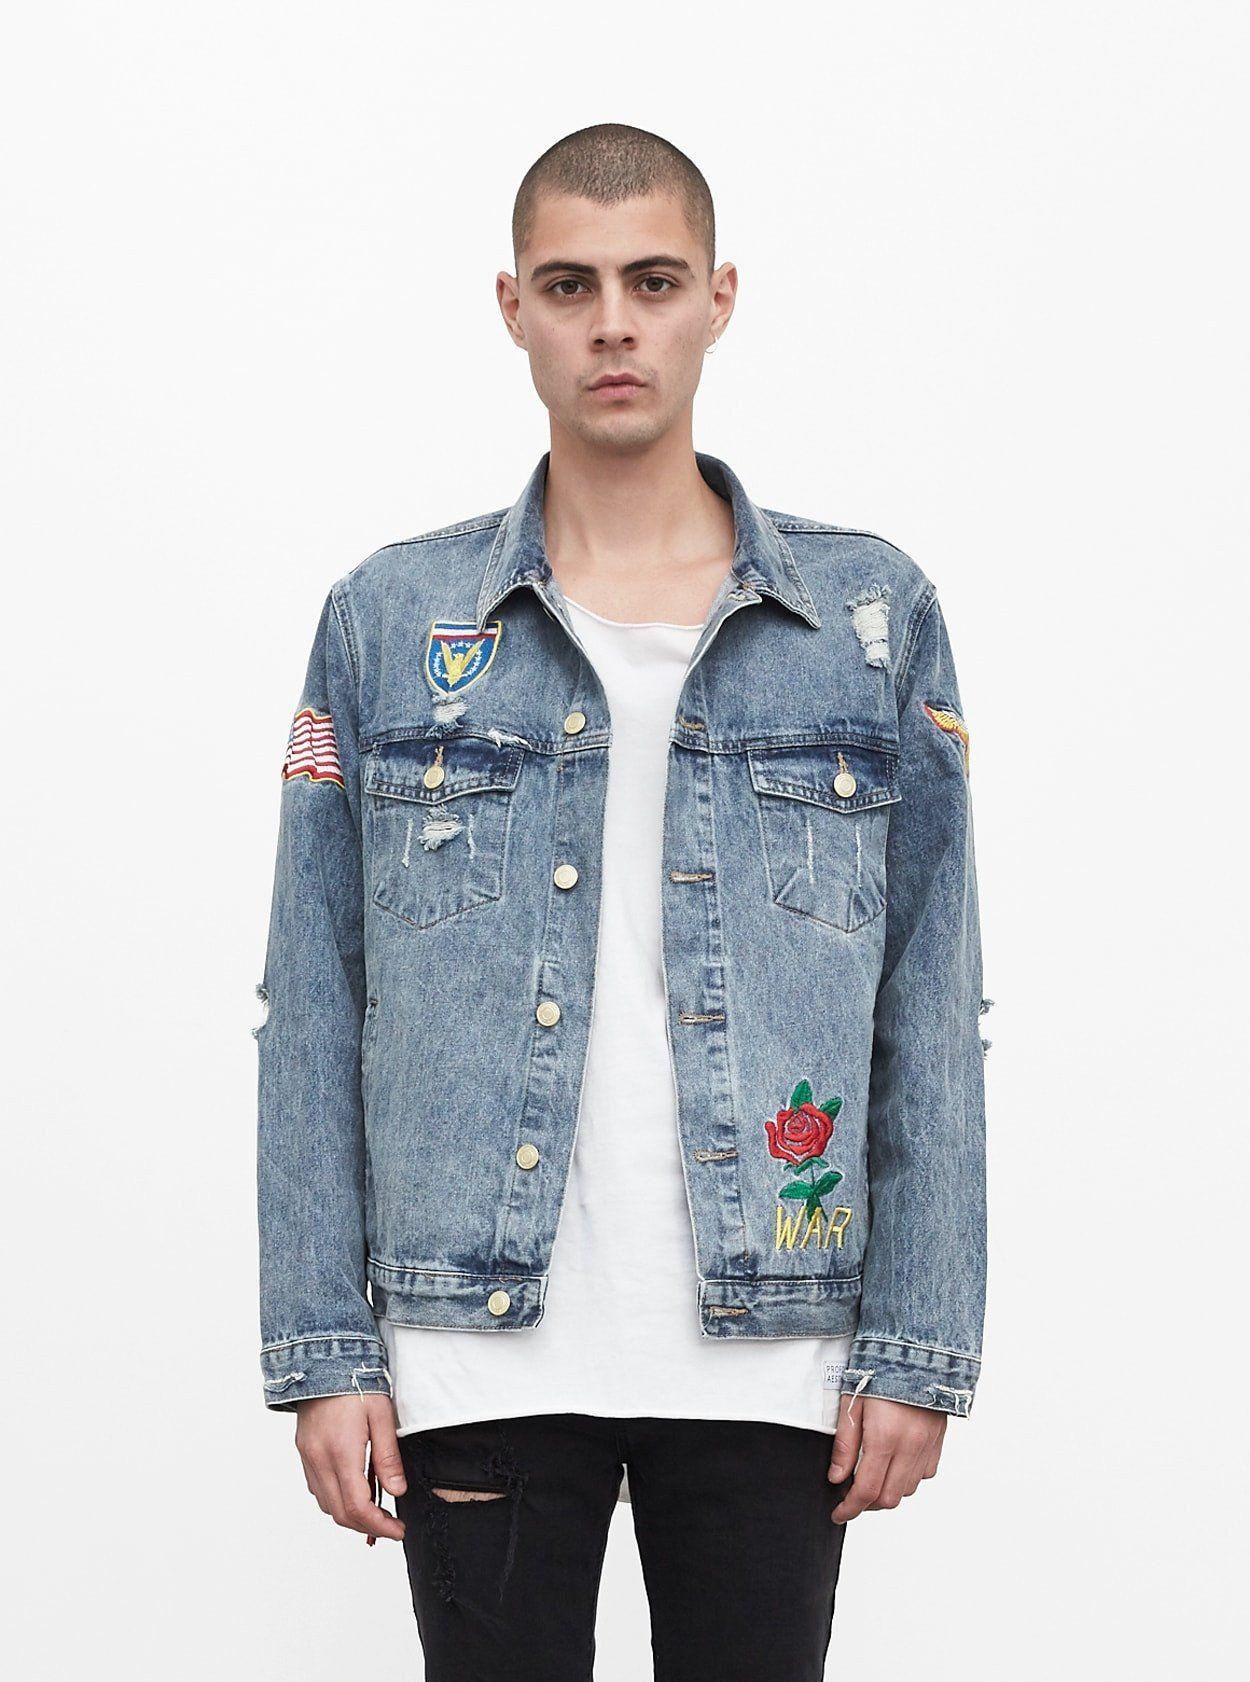 Distressed Rose Patch Denim Jacket Blue Denim Jacket Mens Rose Patch Denim Denim Jacket Patches [ 1682 x 1250 Pixel ]